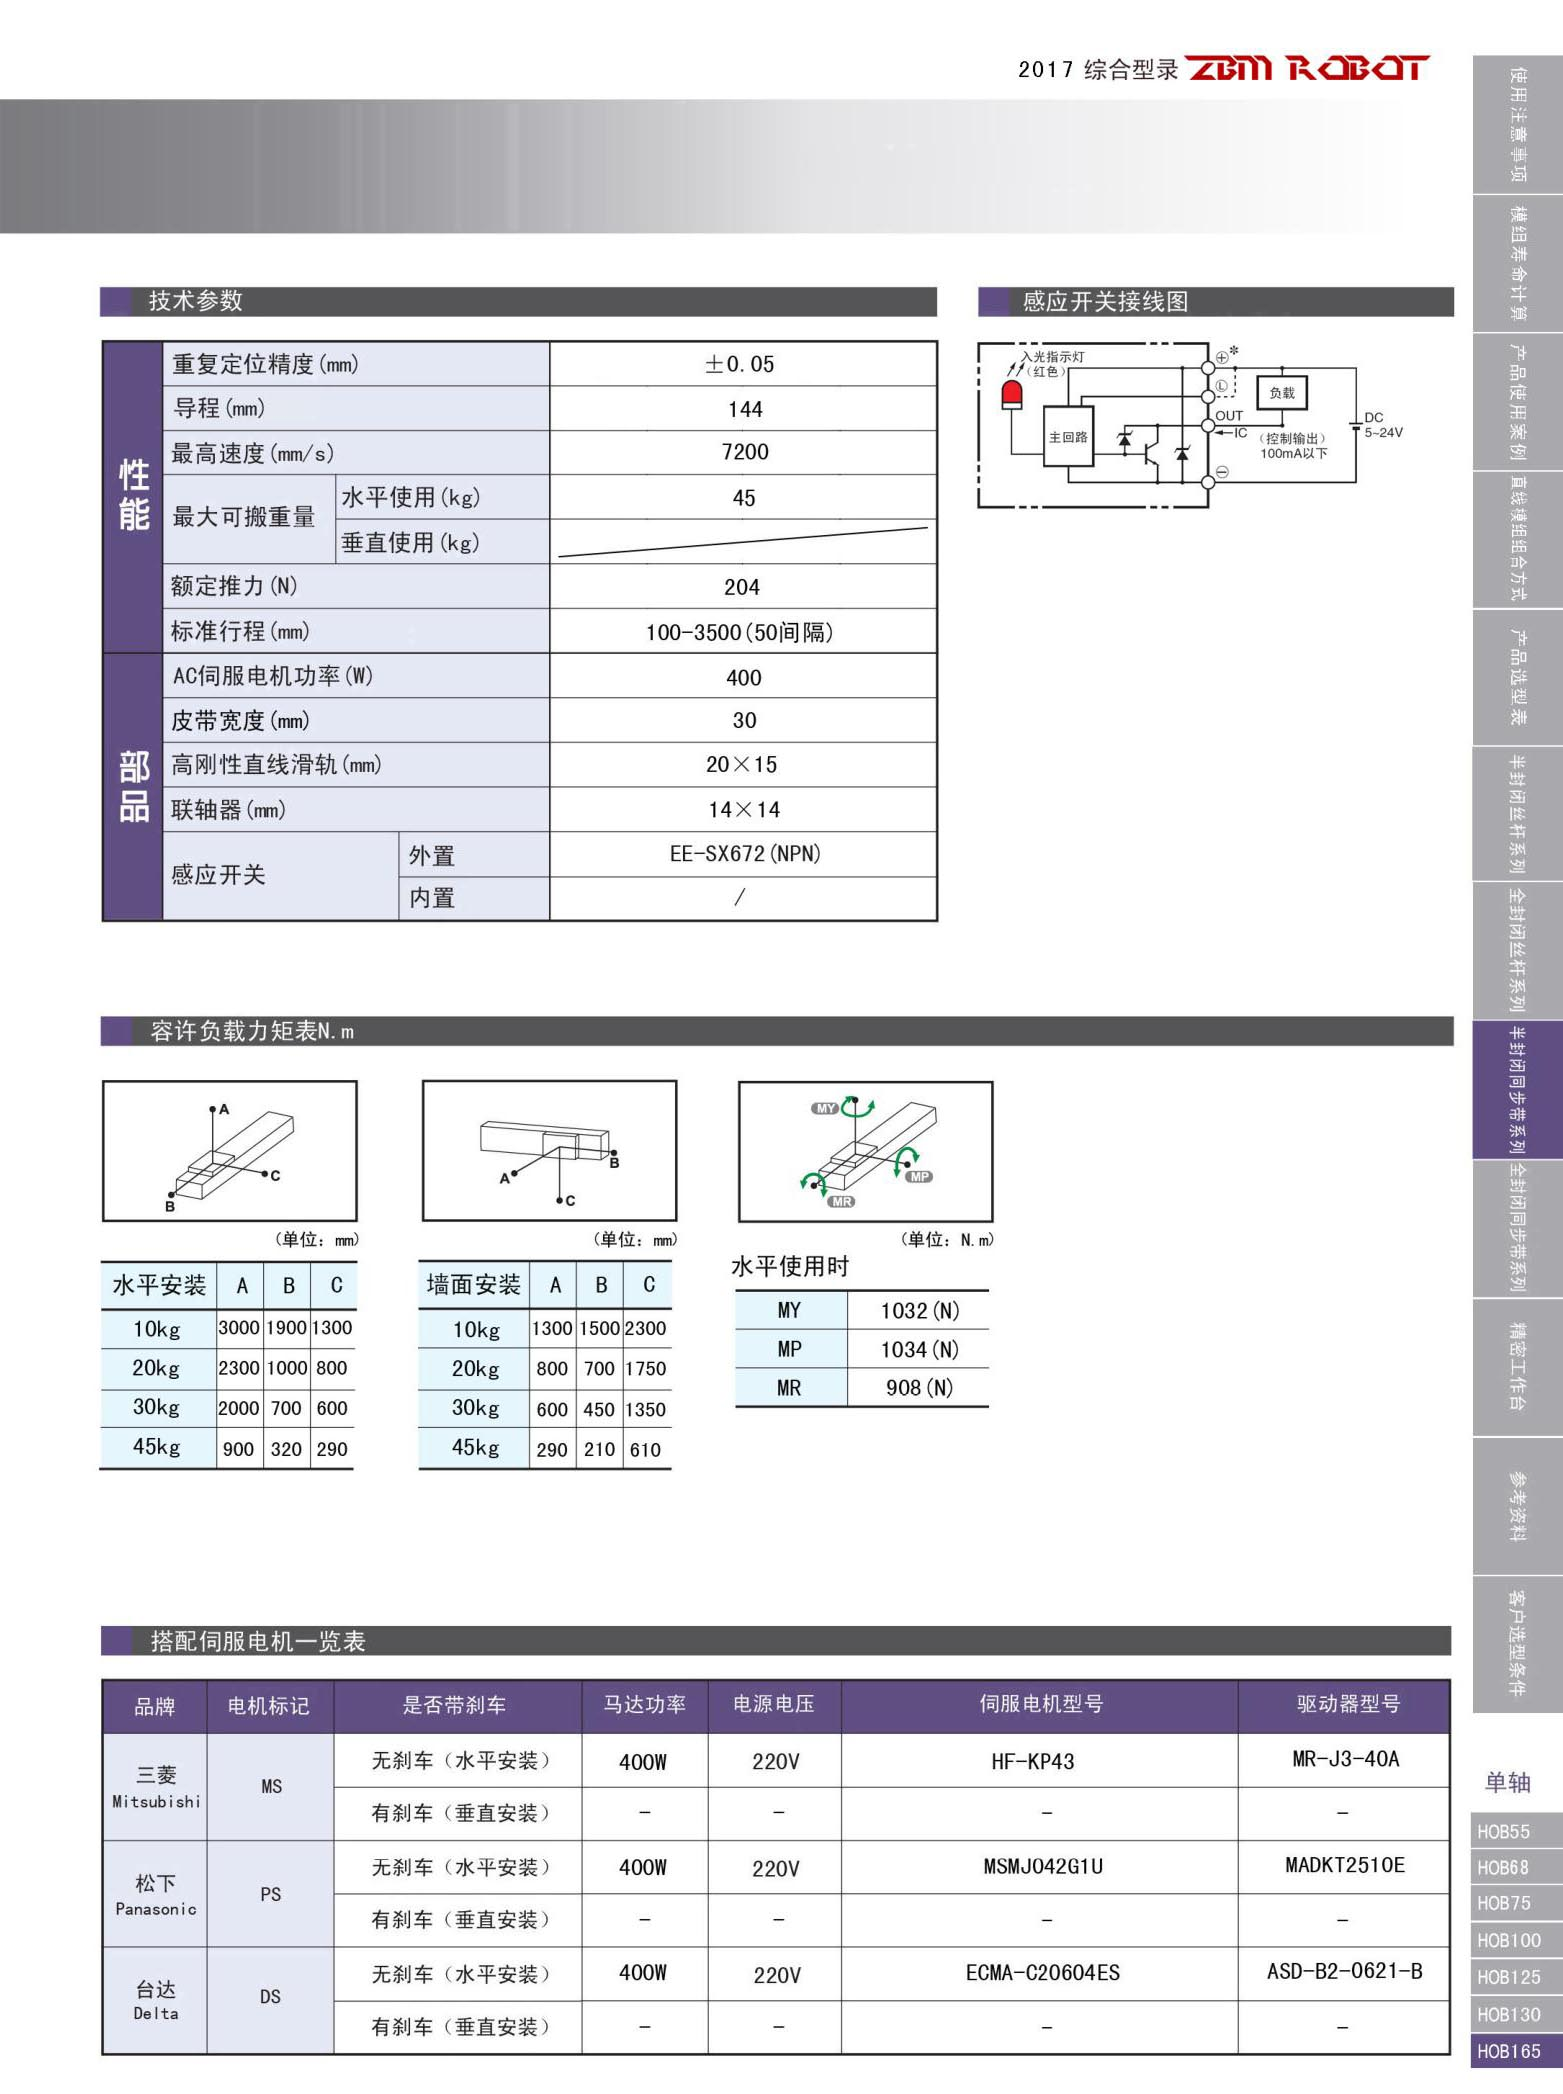 HOB165B-CM|半封闭皮带模组-宝马娱乐在线1211app